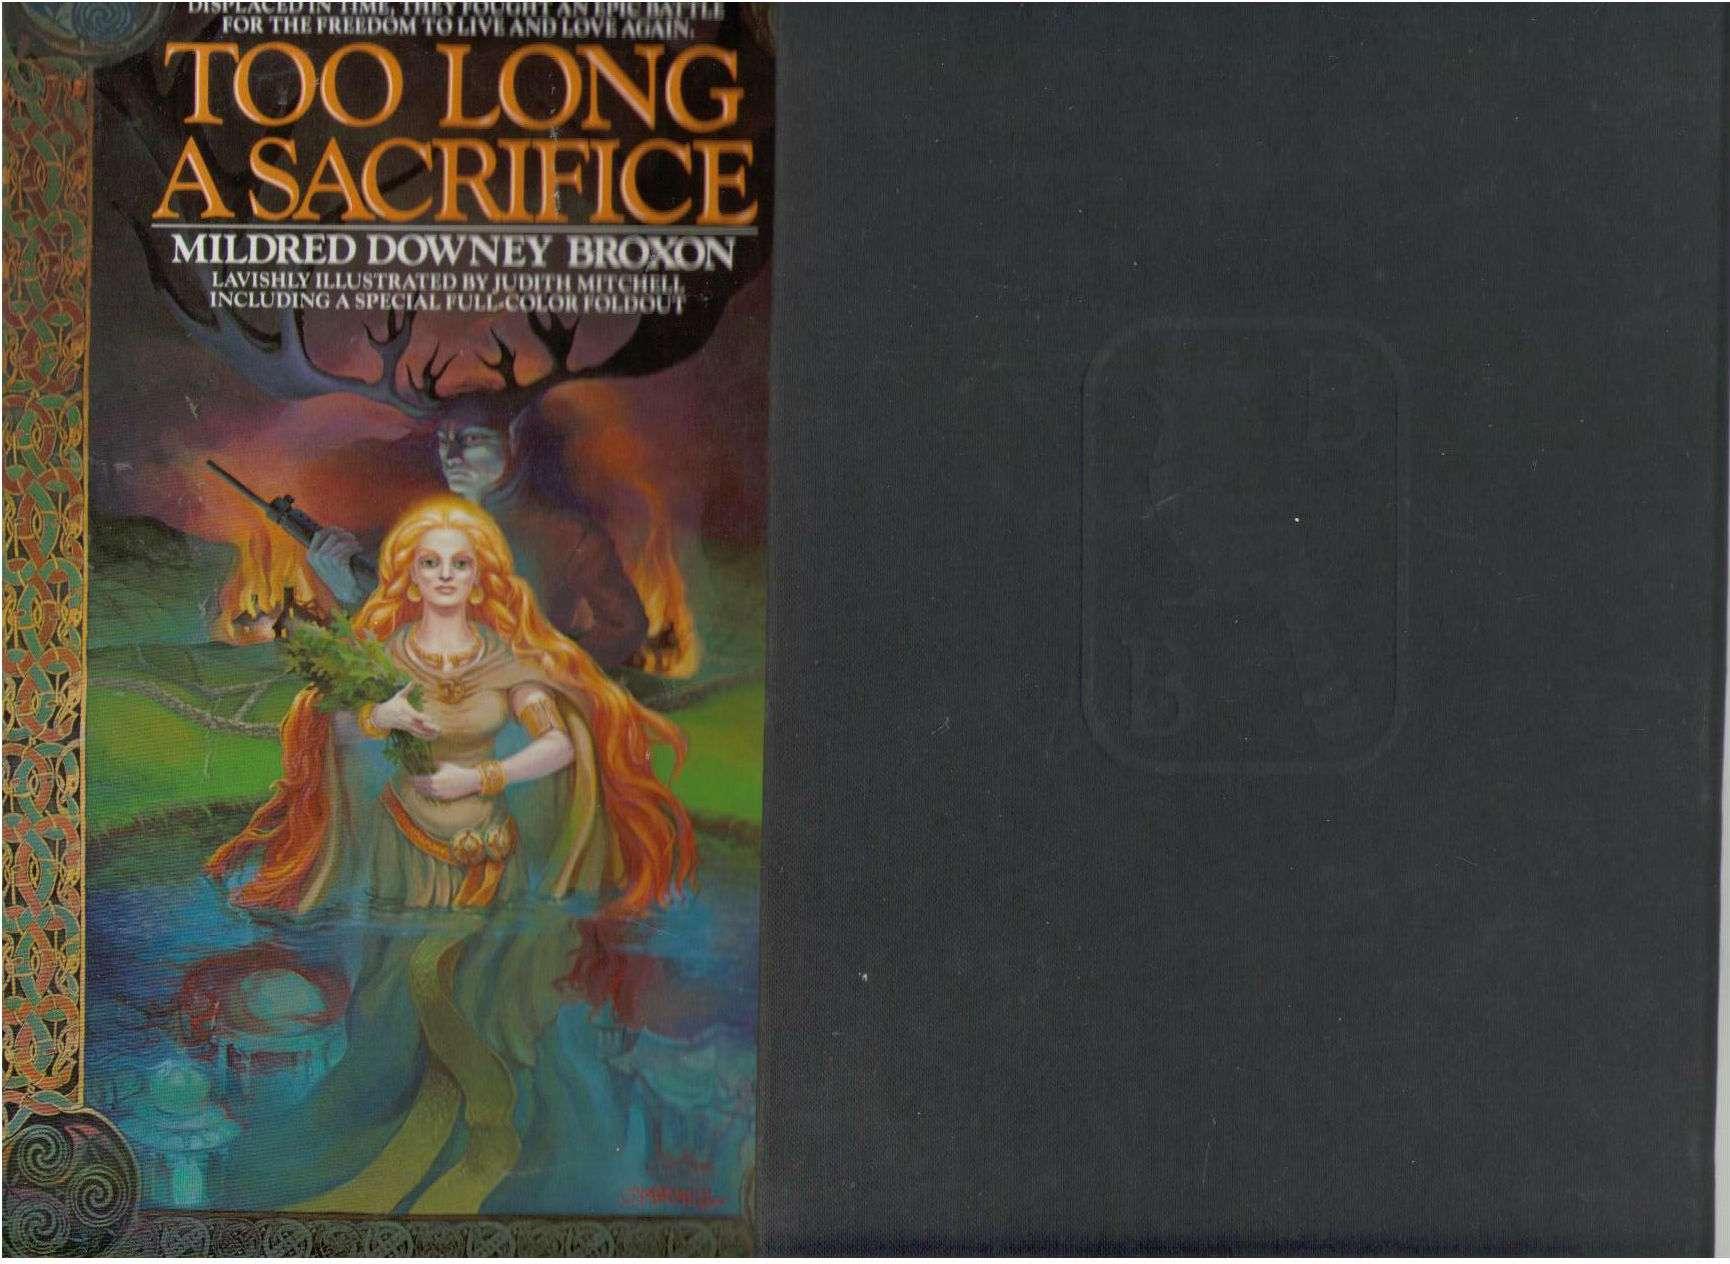 Too Long a Sacrifice, Broxon, Mildred Downey